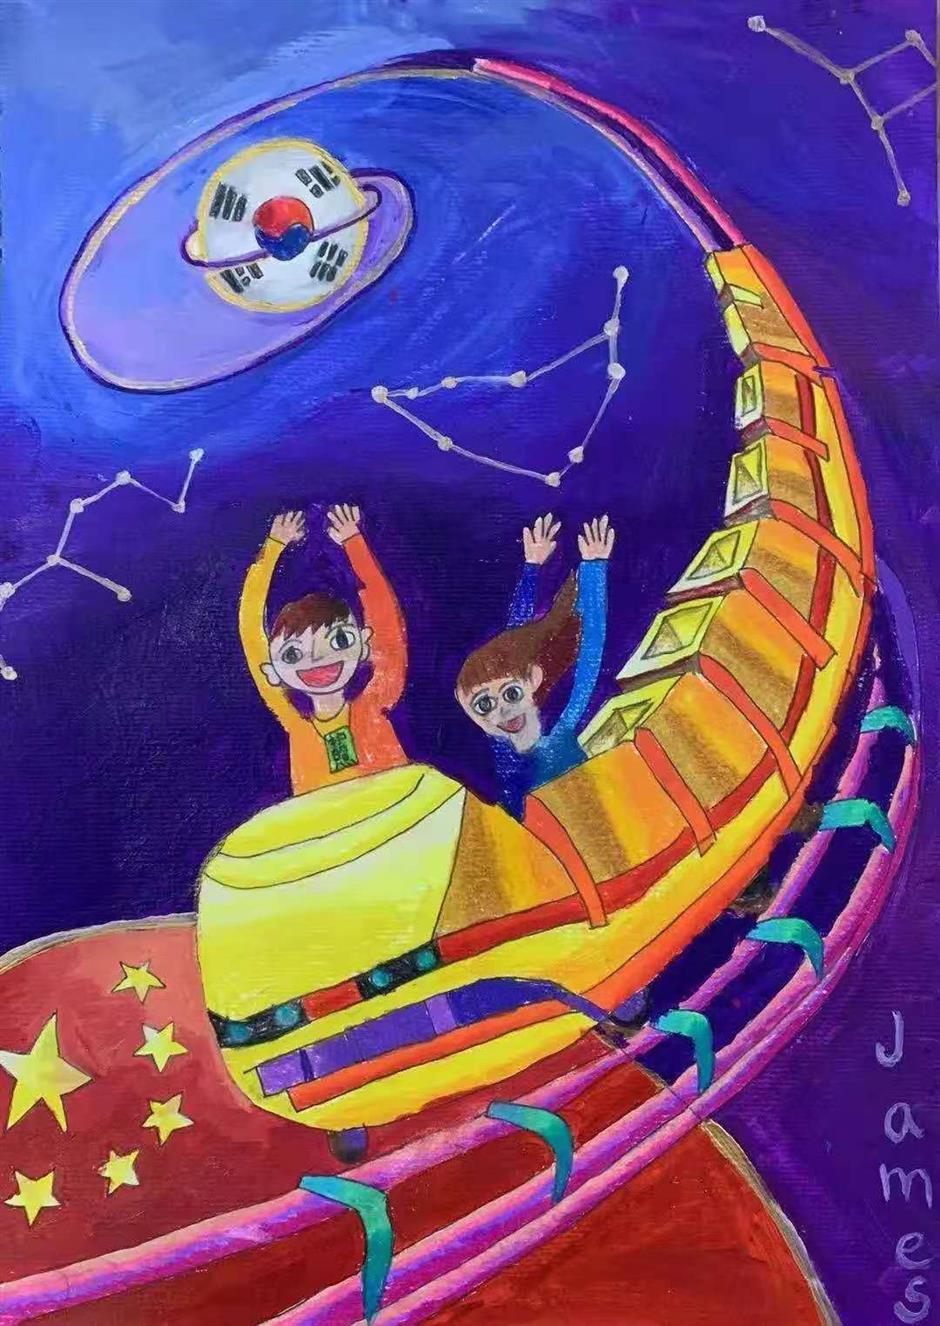 Kids' art depicts dreams of a post-COVID-19 future